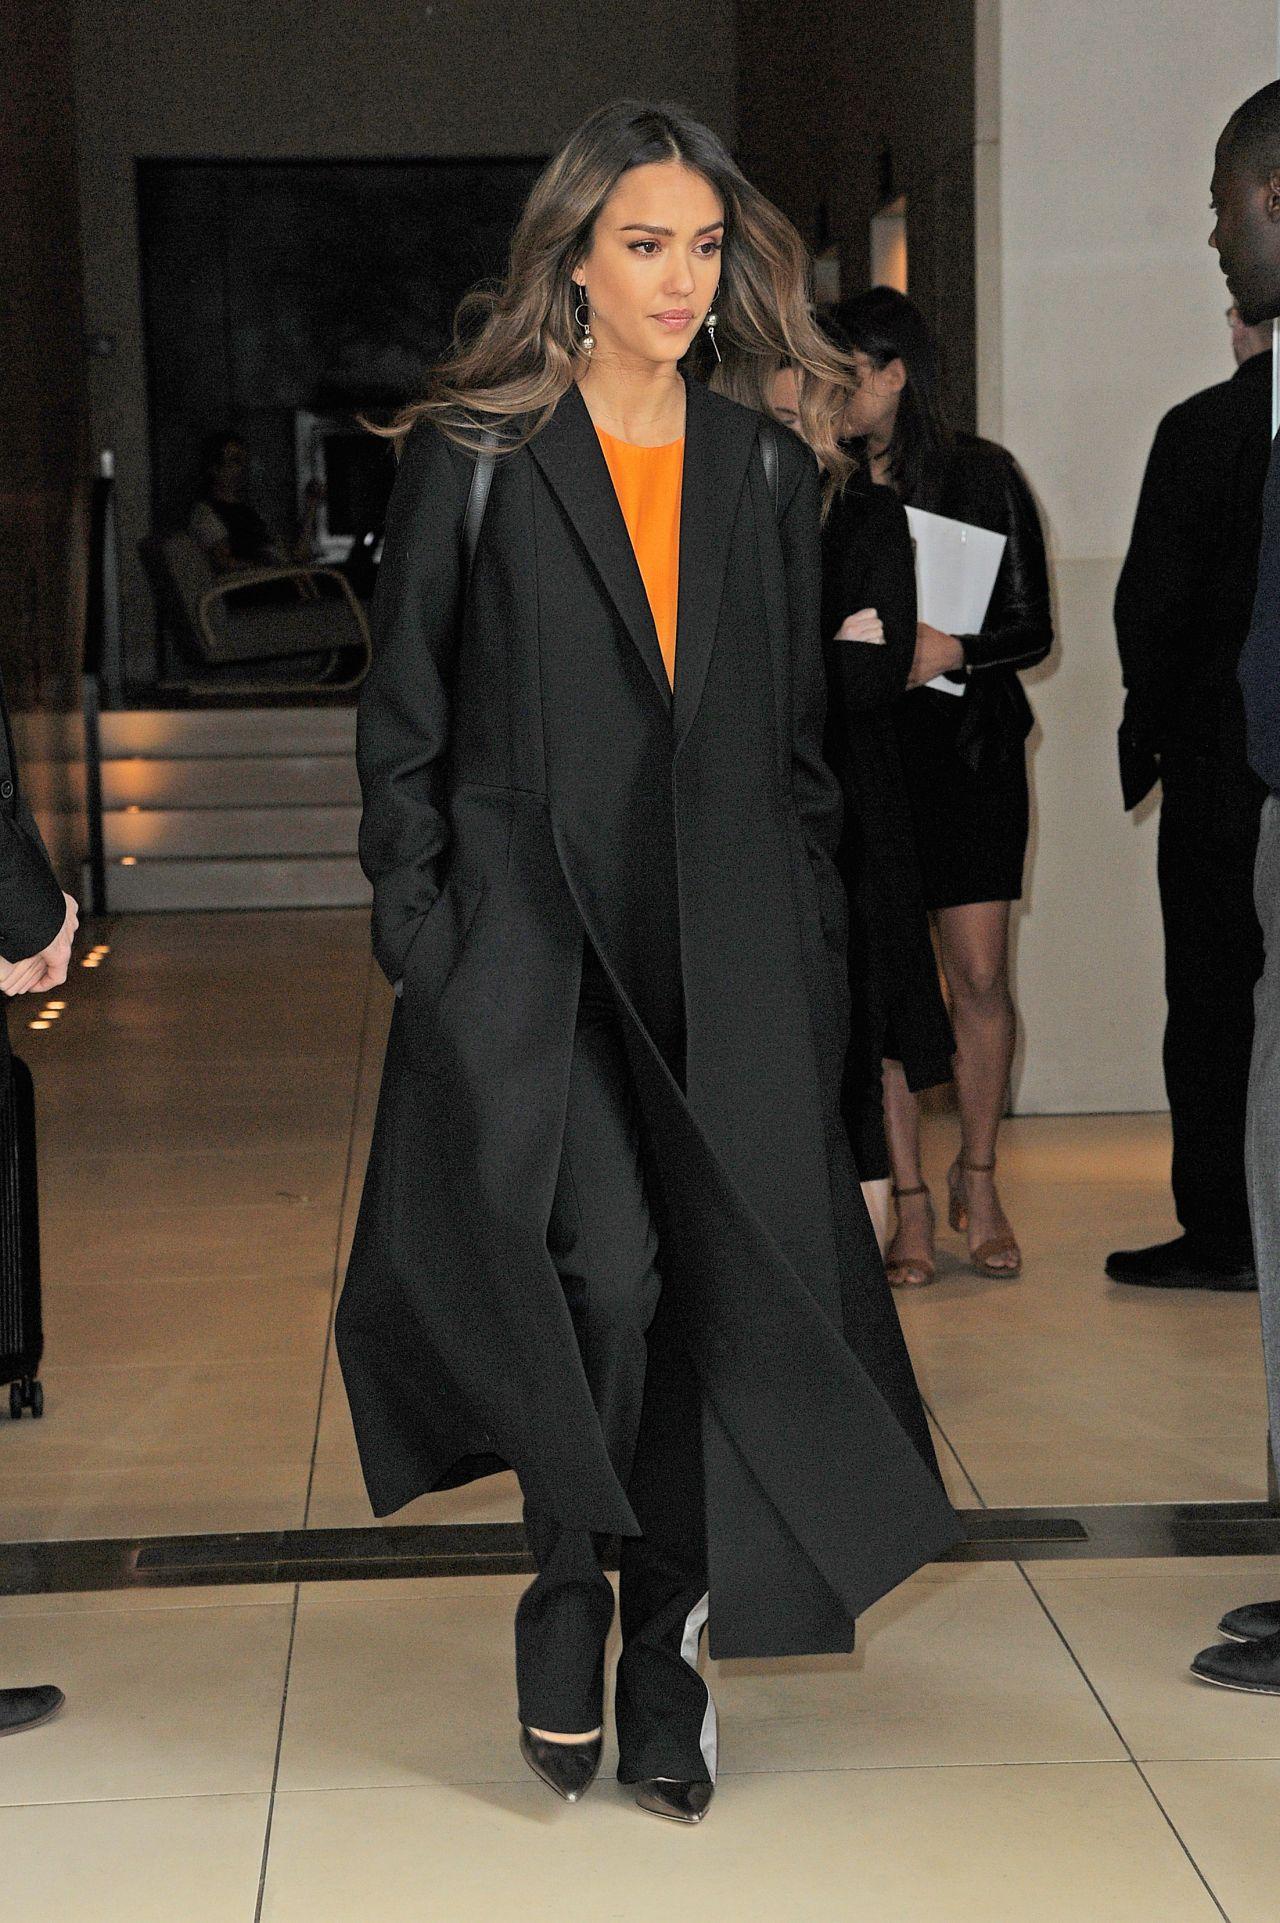 Jessica Alba - Out in Manhattan, New York 4/17/2017